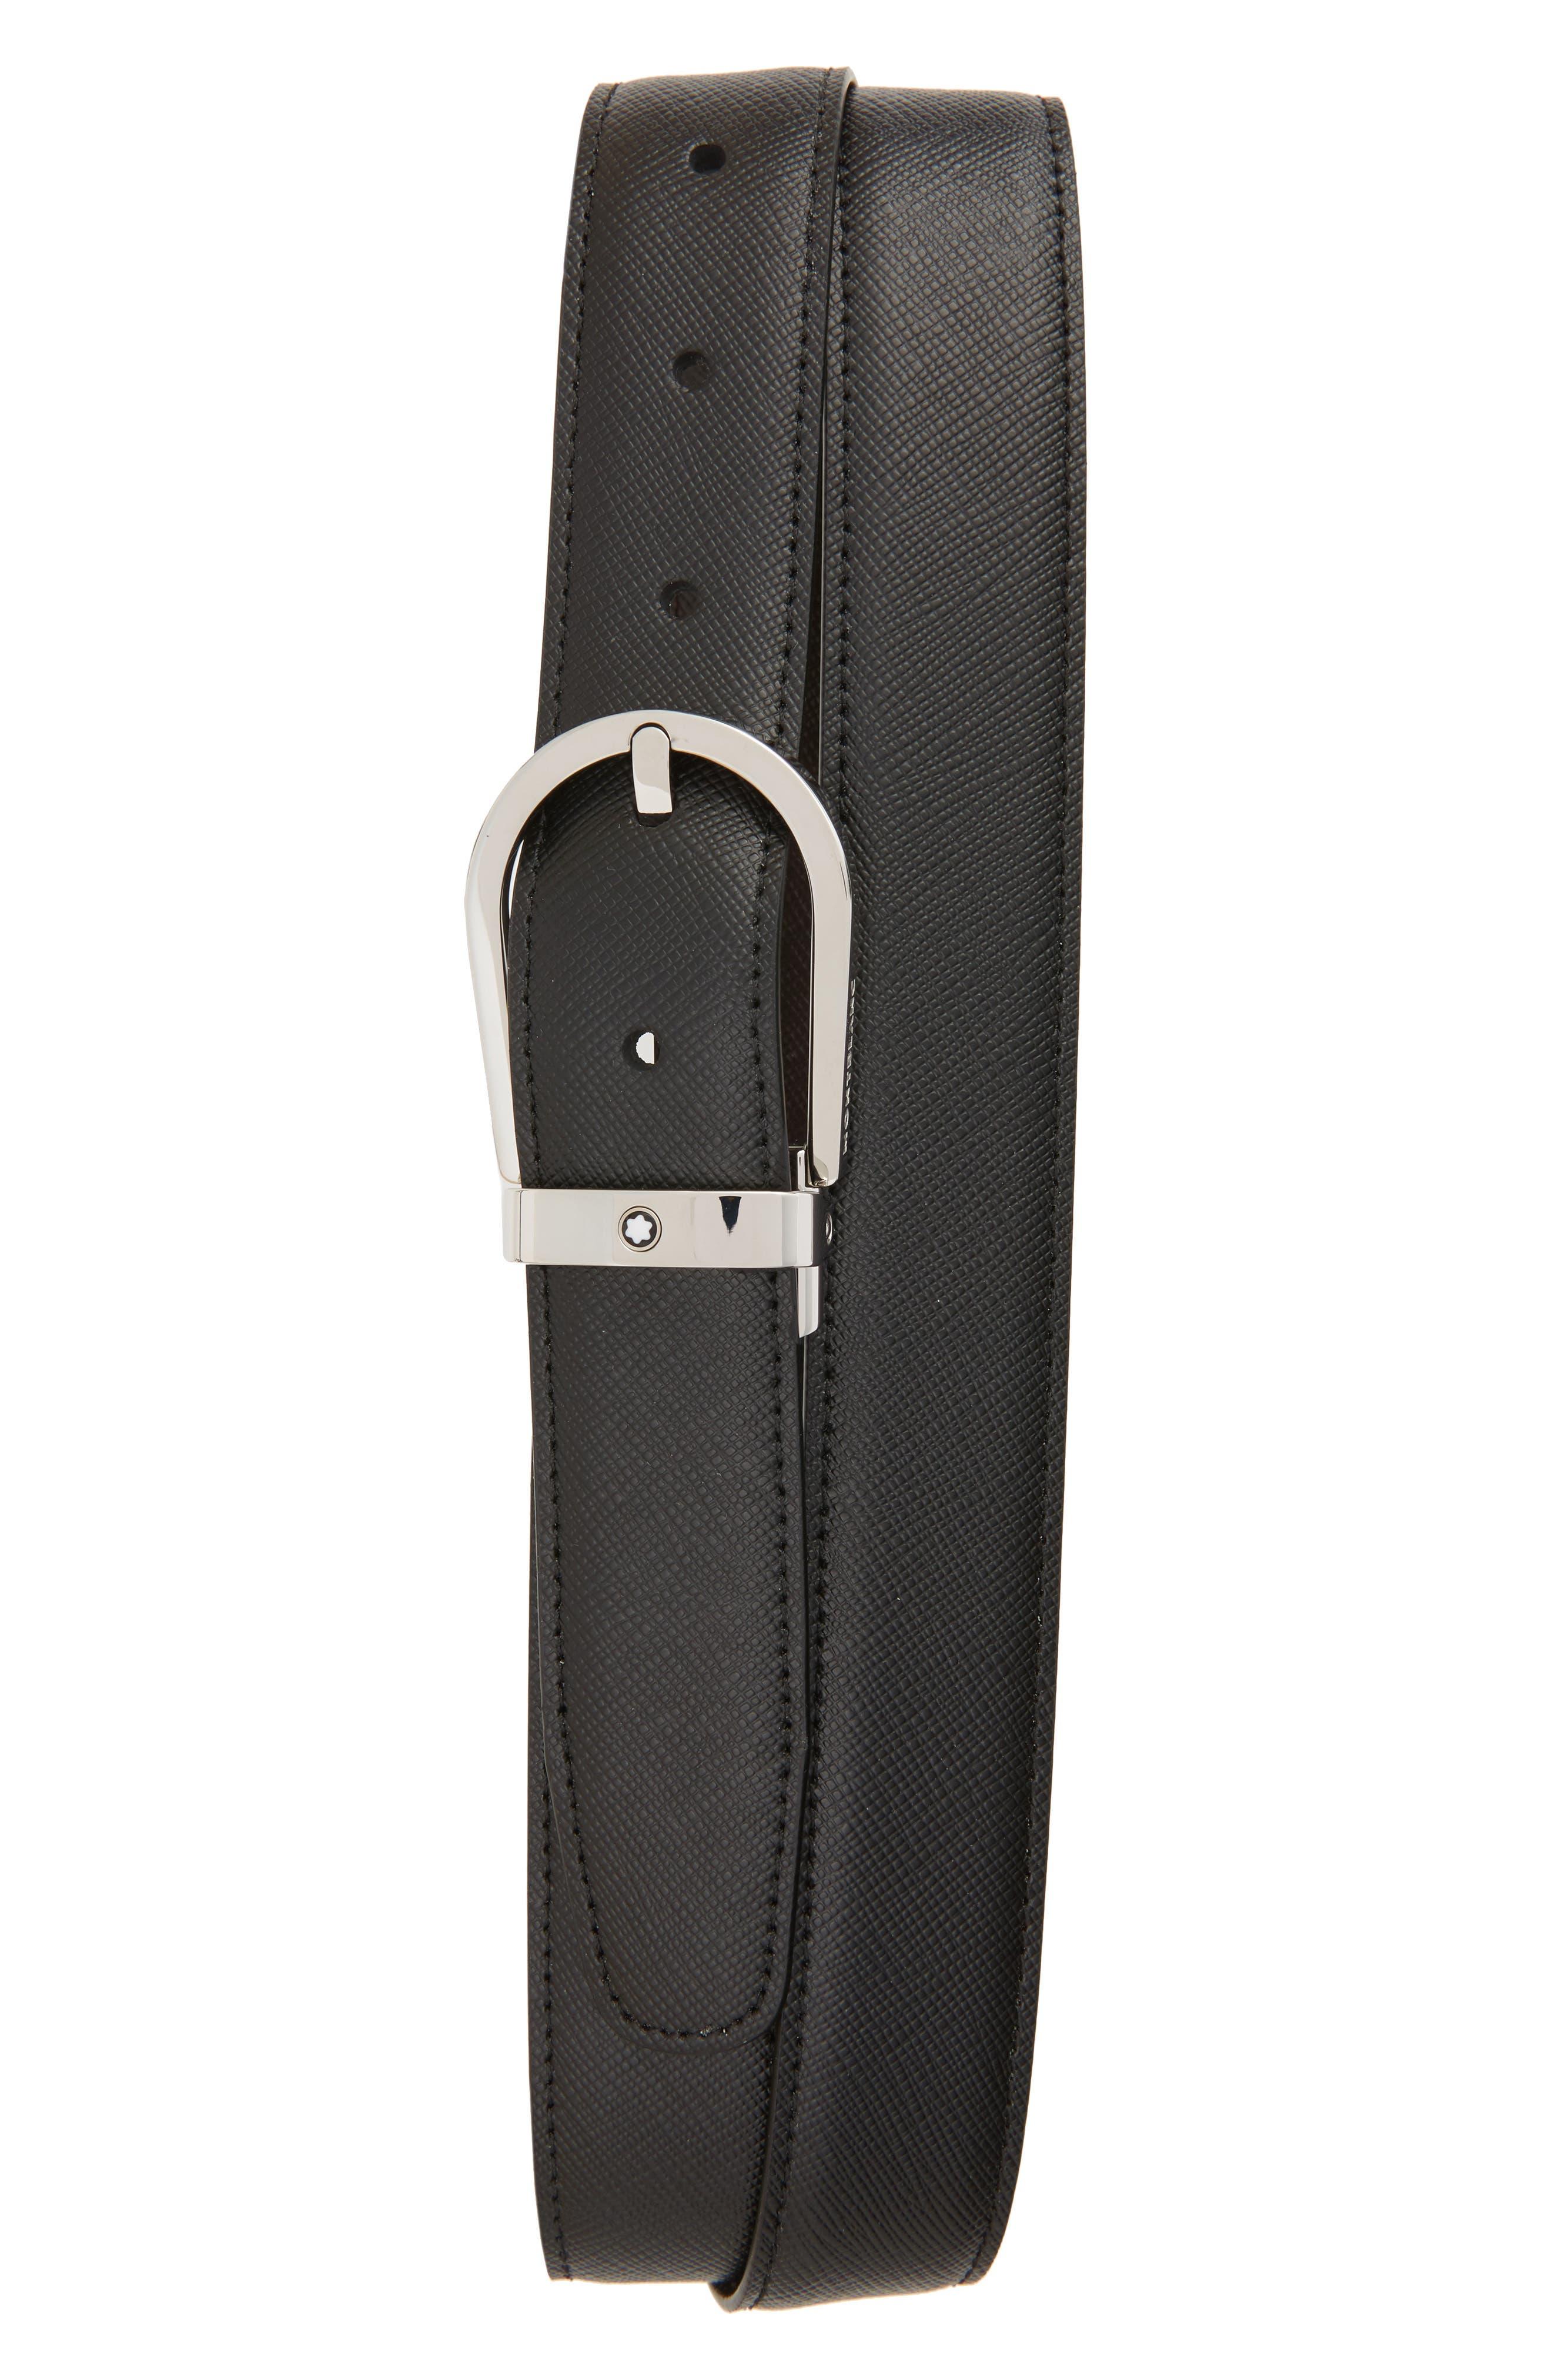 MONTBLANC, Horseshoe Buckle Reversible Sartorial Leather Belt, Main thumbnail 1, color, BLACK/ BROWN